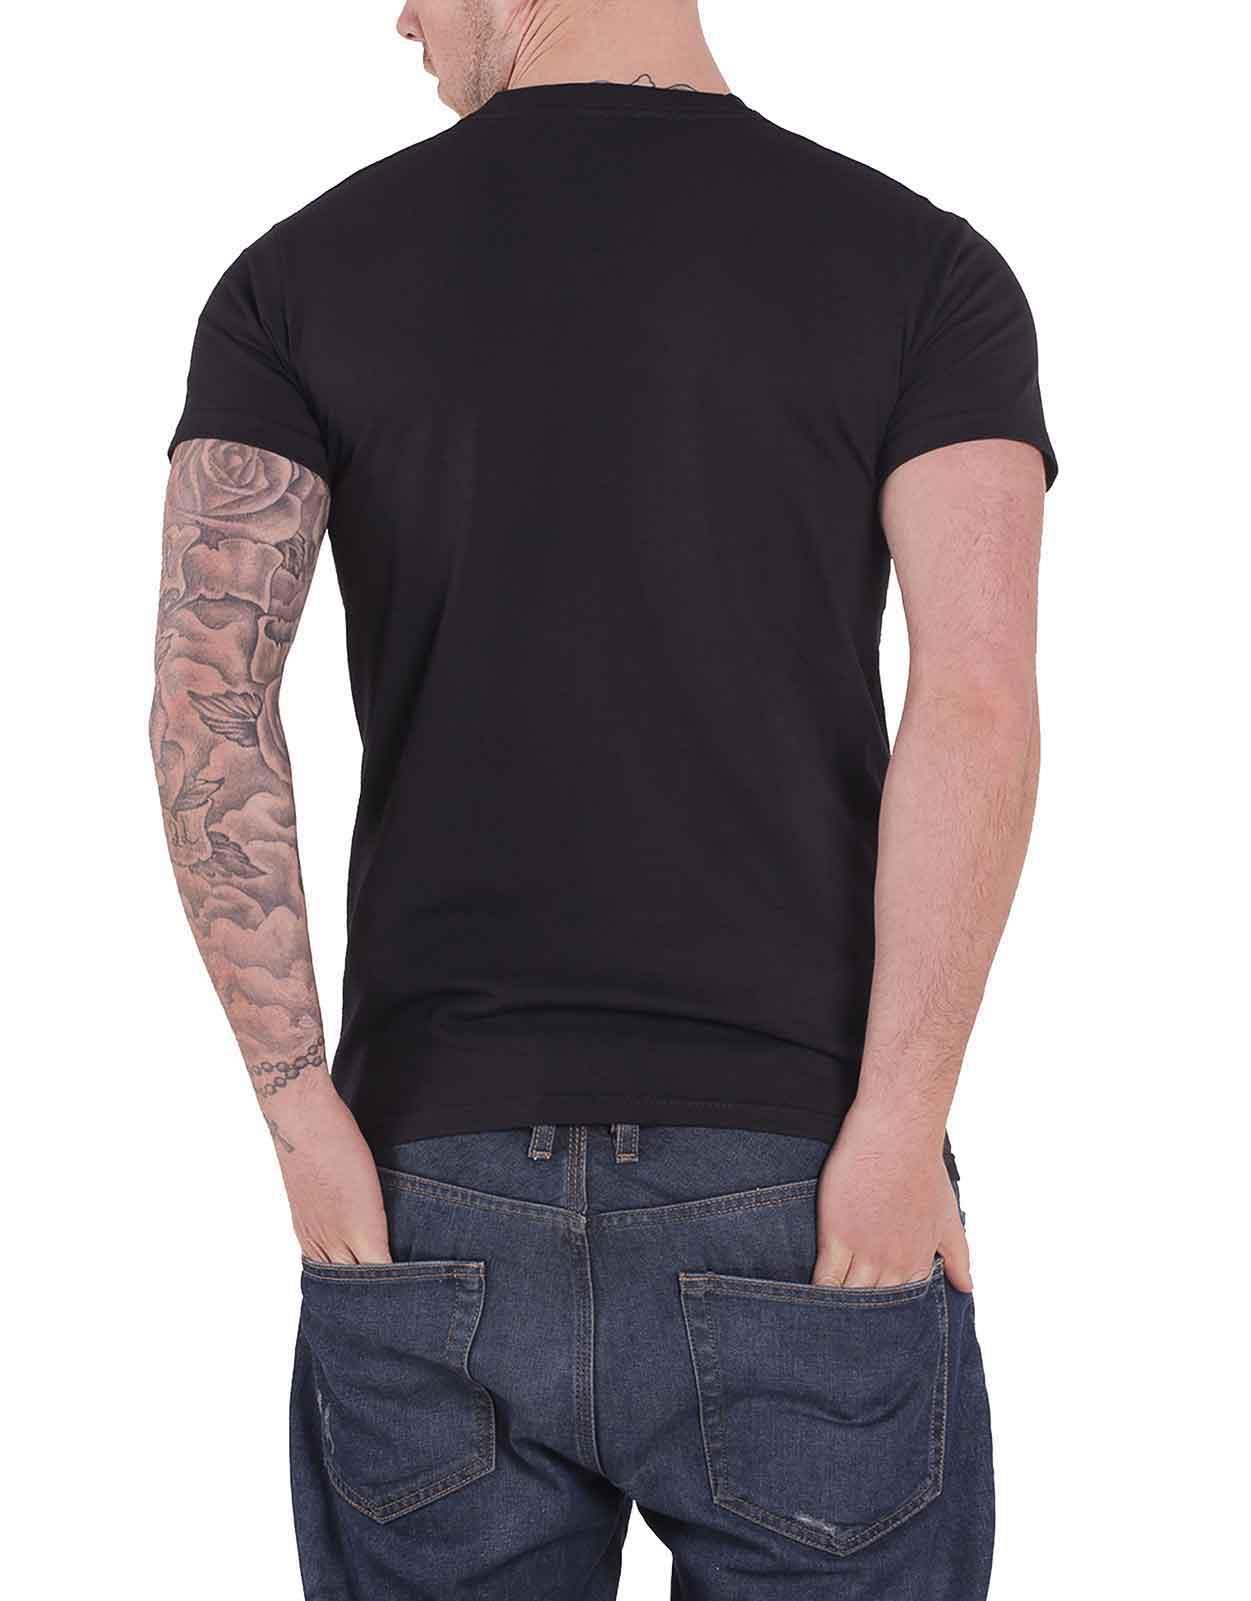 Officiel-Metallica-T-shirt-filaire-justice-for-all-RTL-Band-Logo-Homme-Nouveau miniature 51